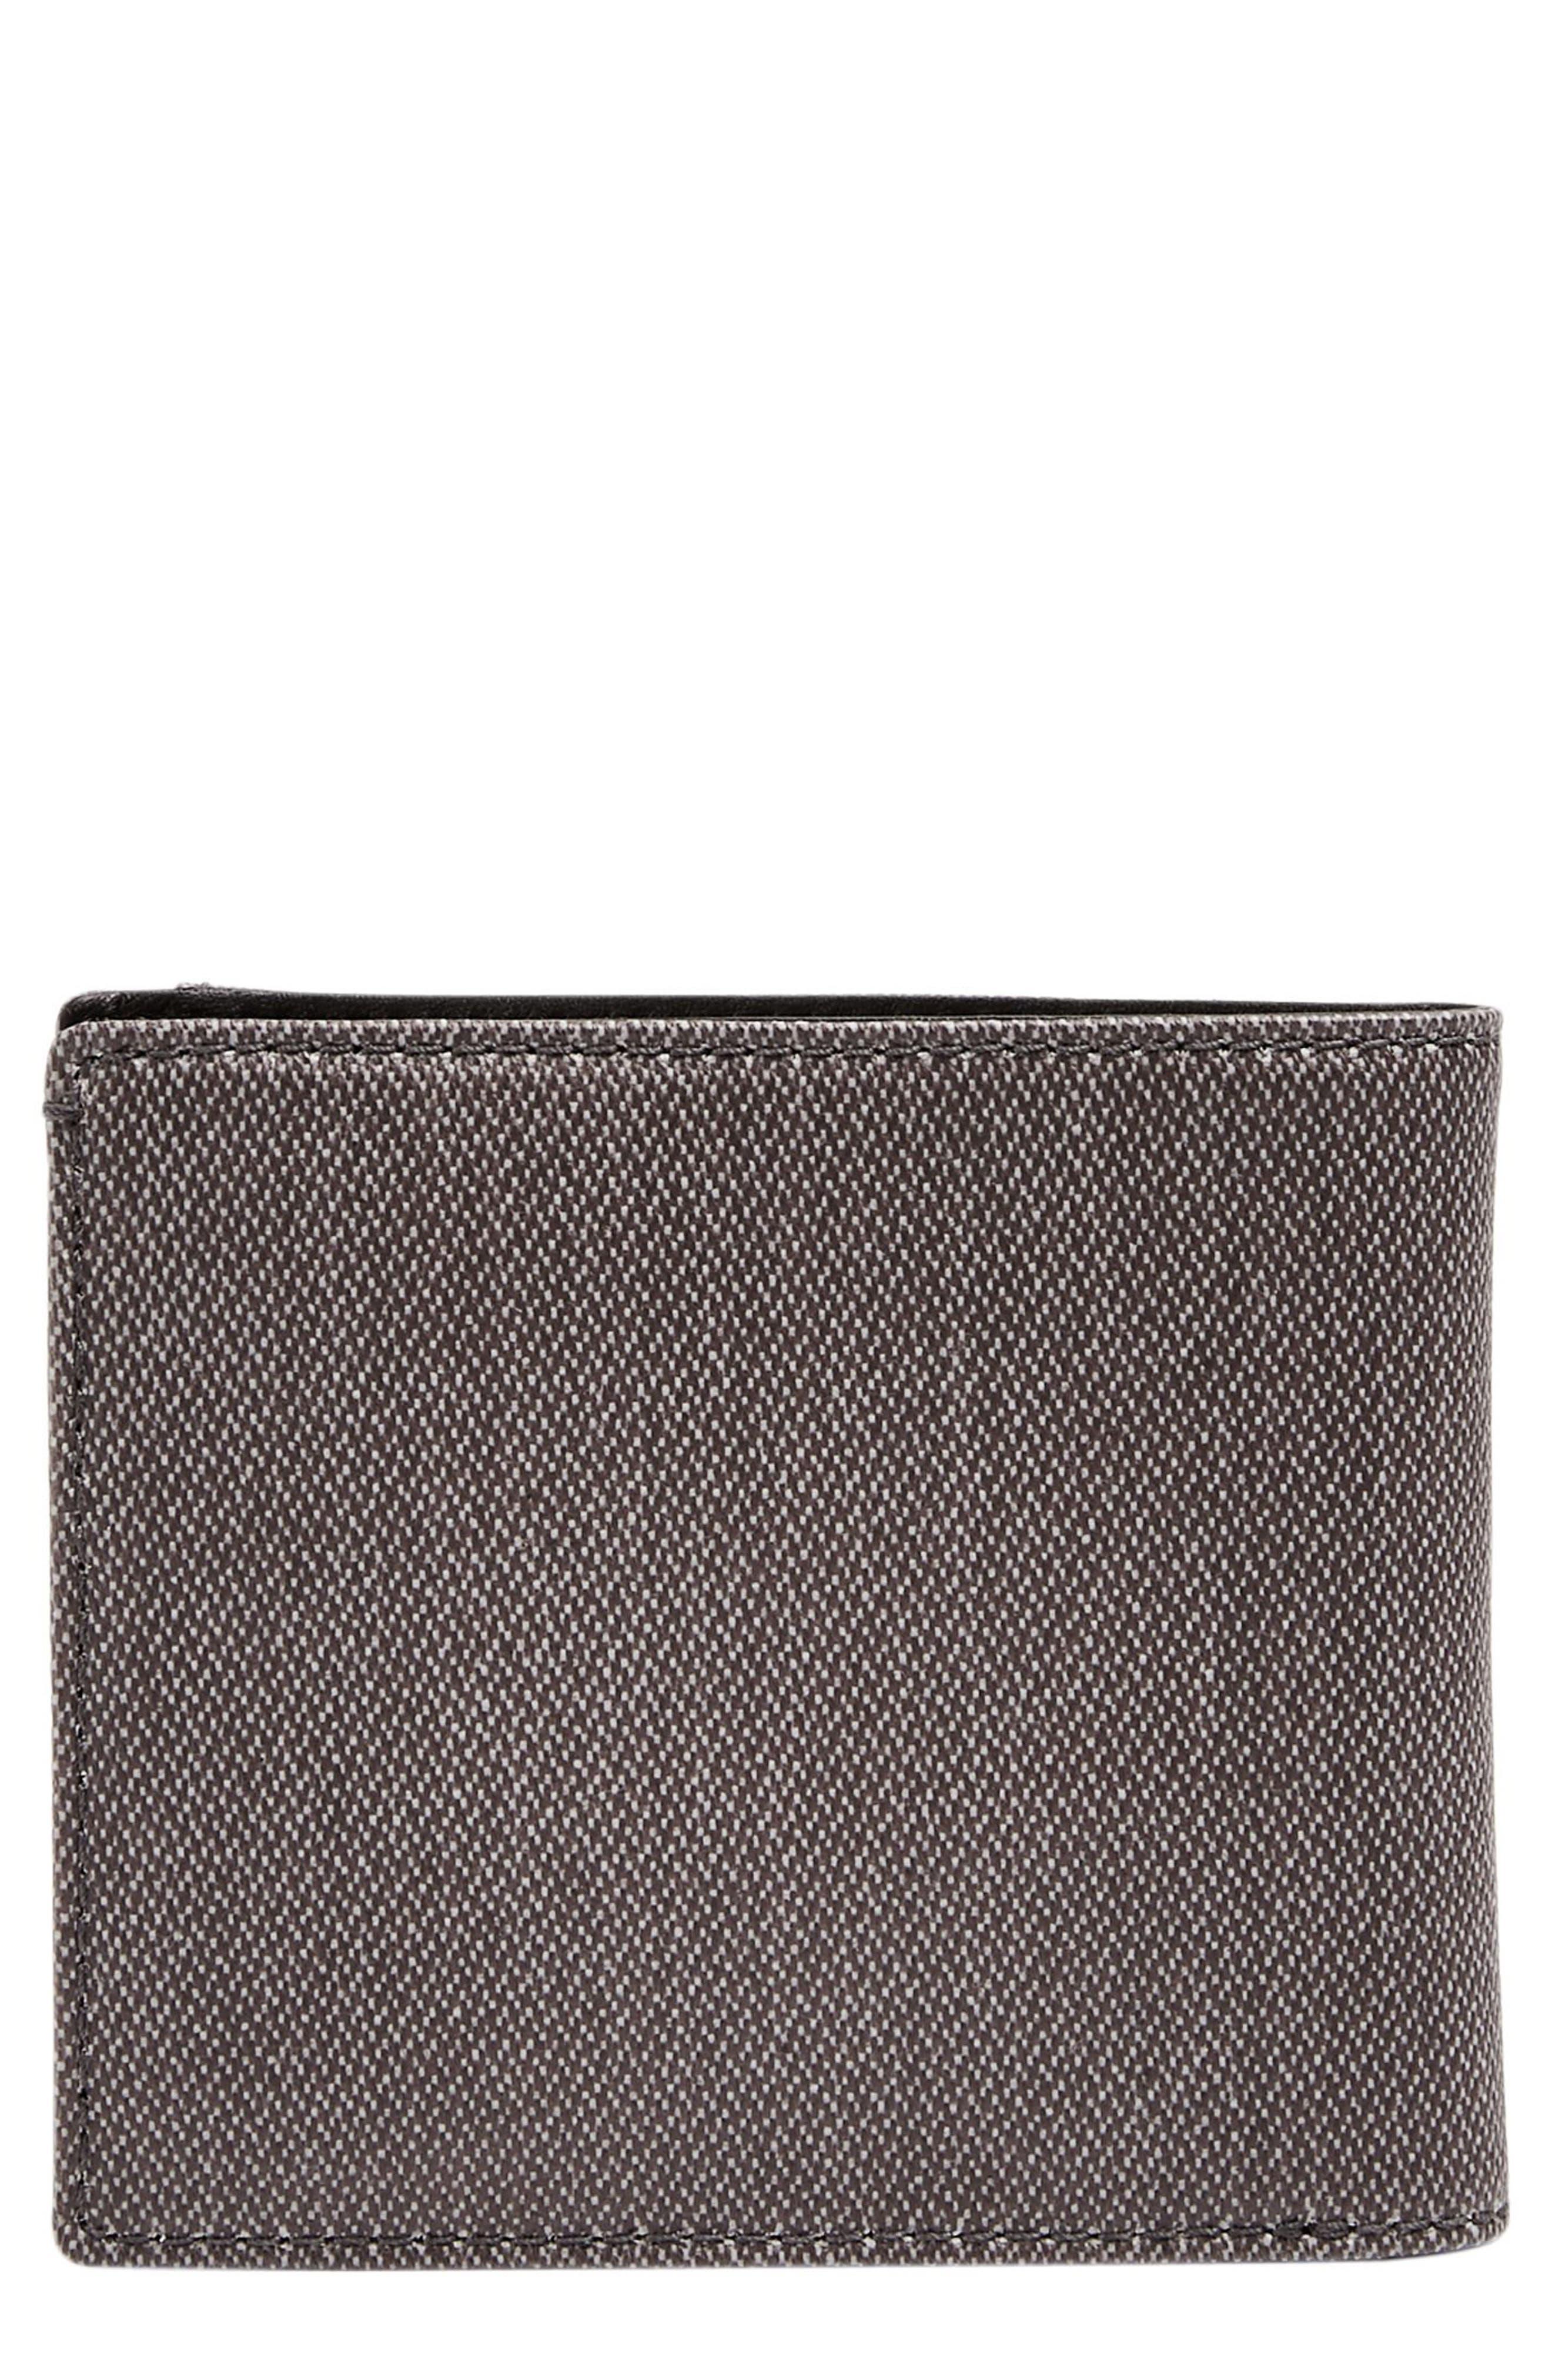 Main Image - Skagen Passcase Wallet